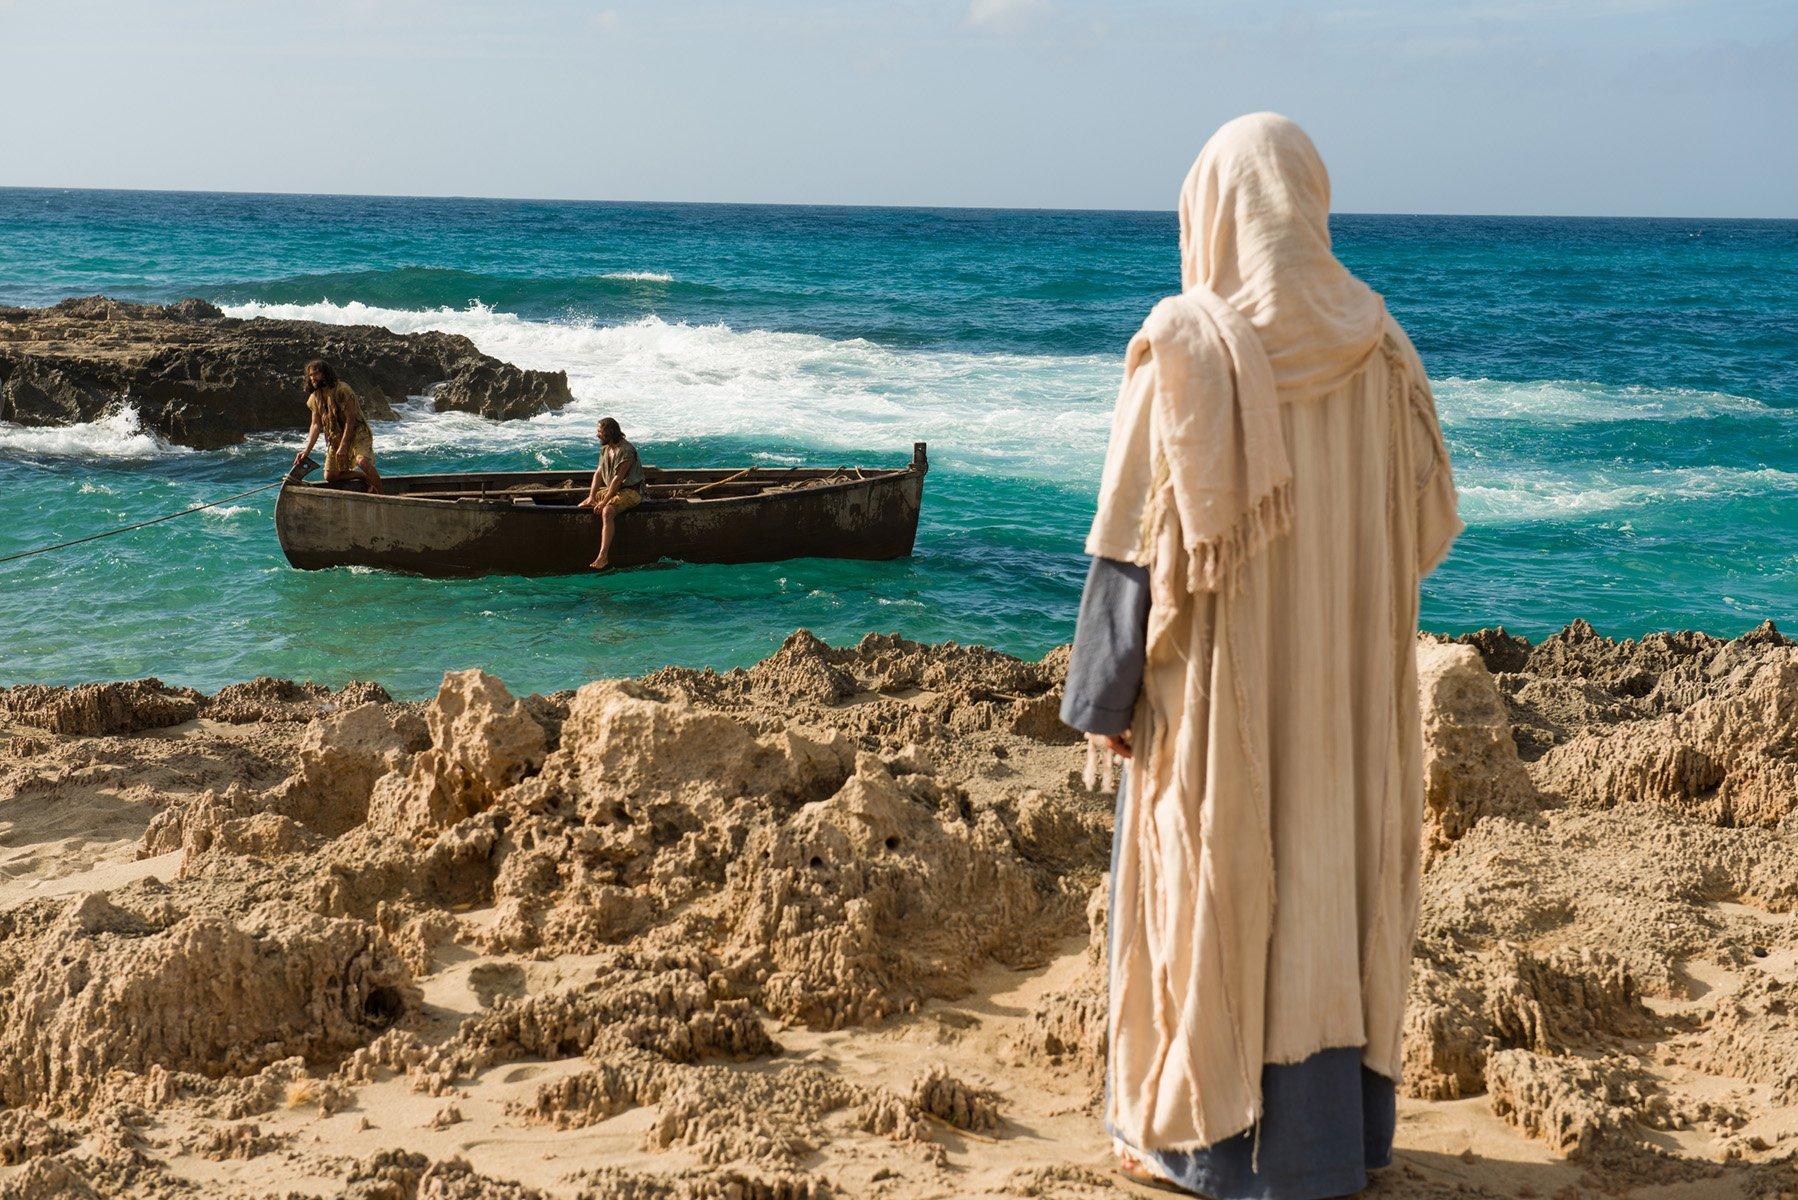 christ-calling-fishermen-1212783-print